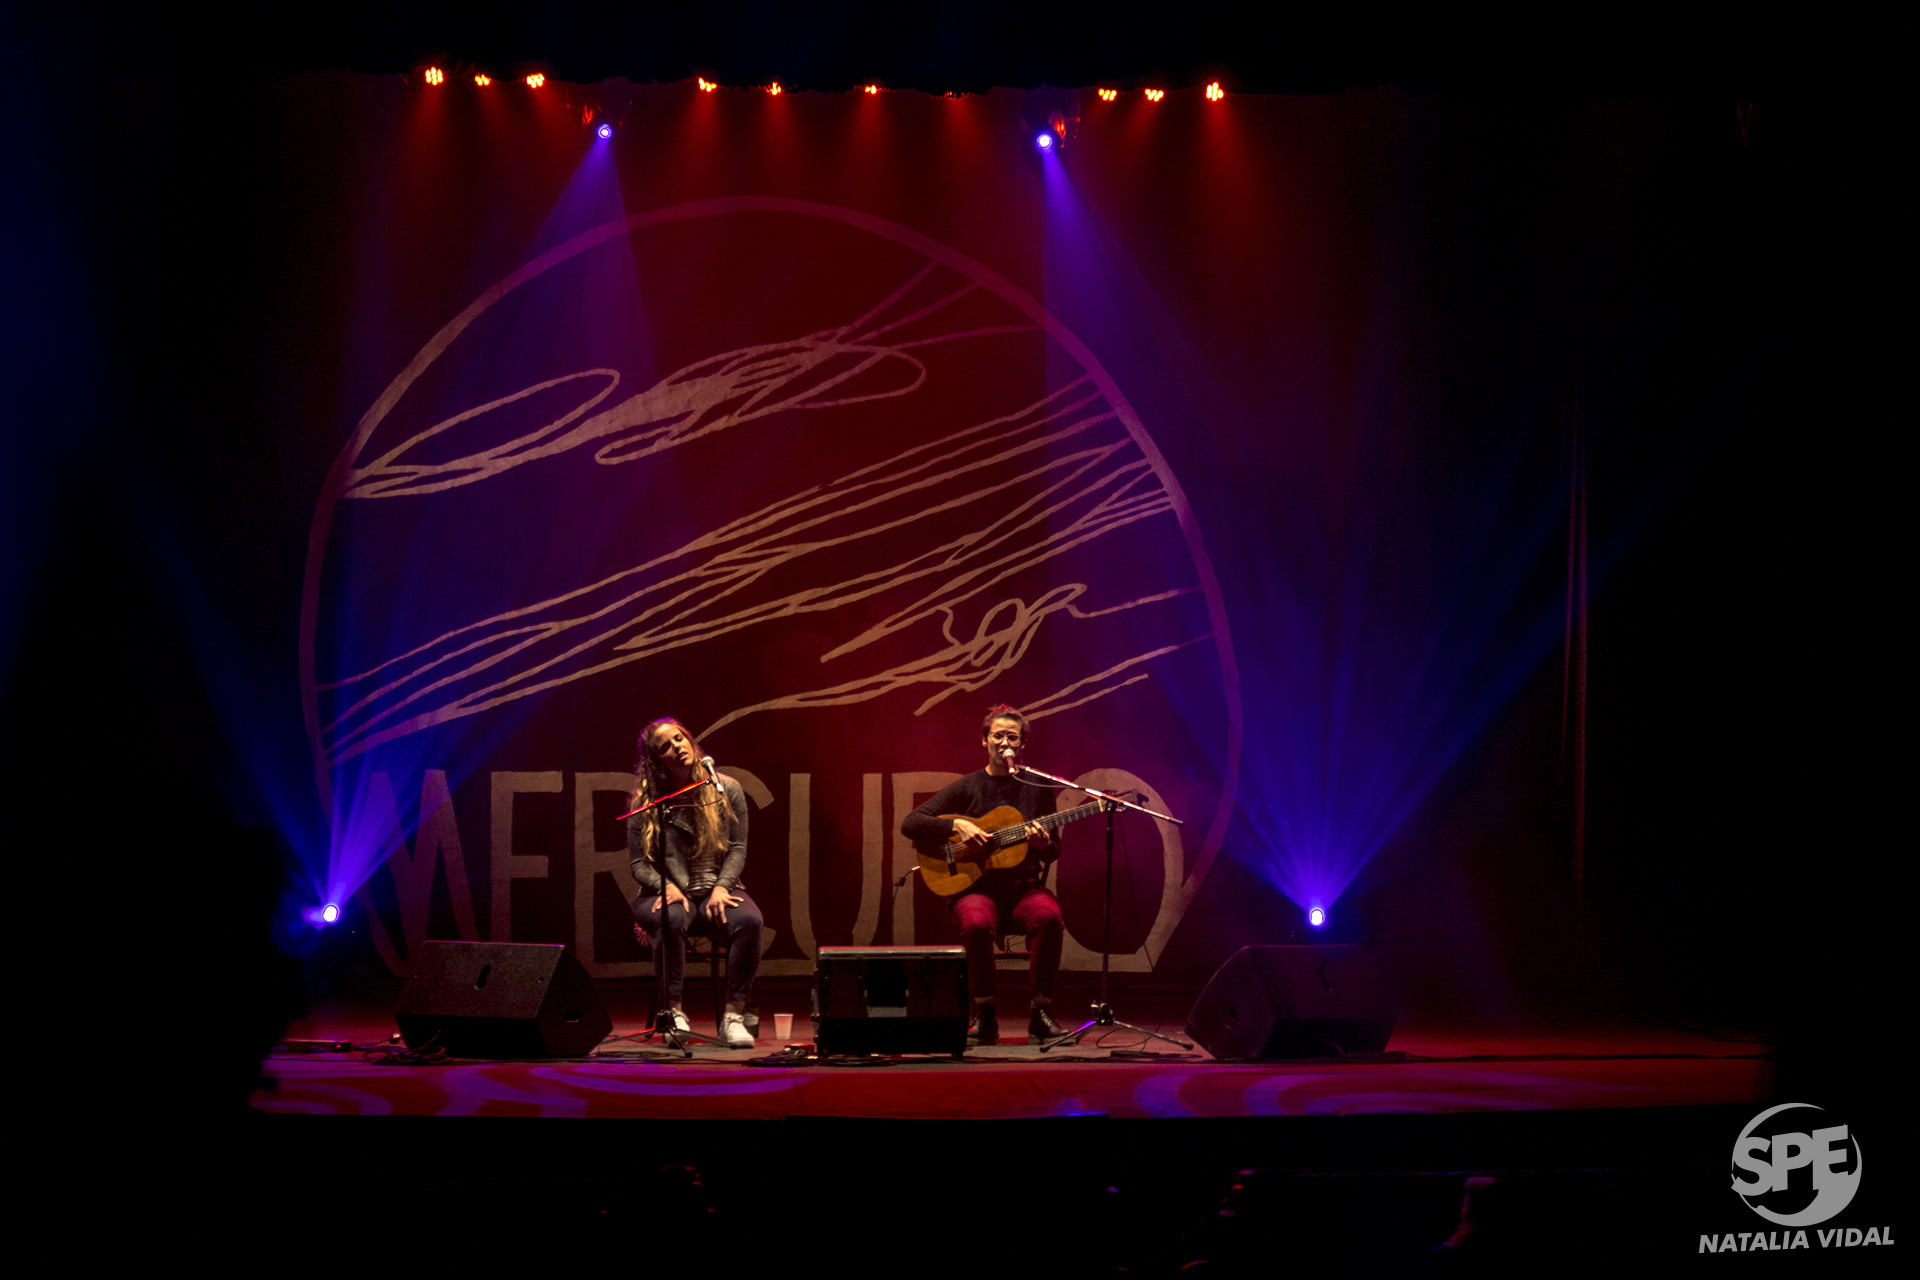 Perota-Chingo-Festi-Mercurio-Teatro-Xirgu-30-06-18-Natalia-Vidal-Solo-Para-Entendidos_360.jpg